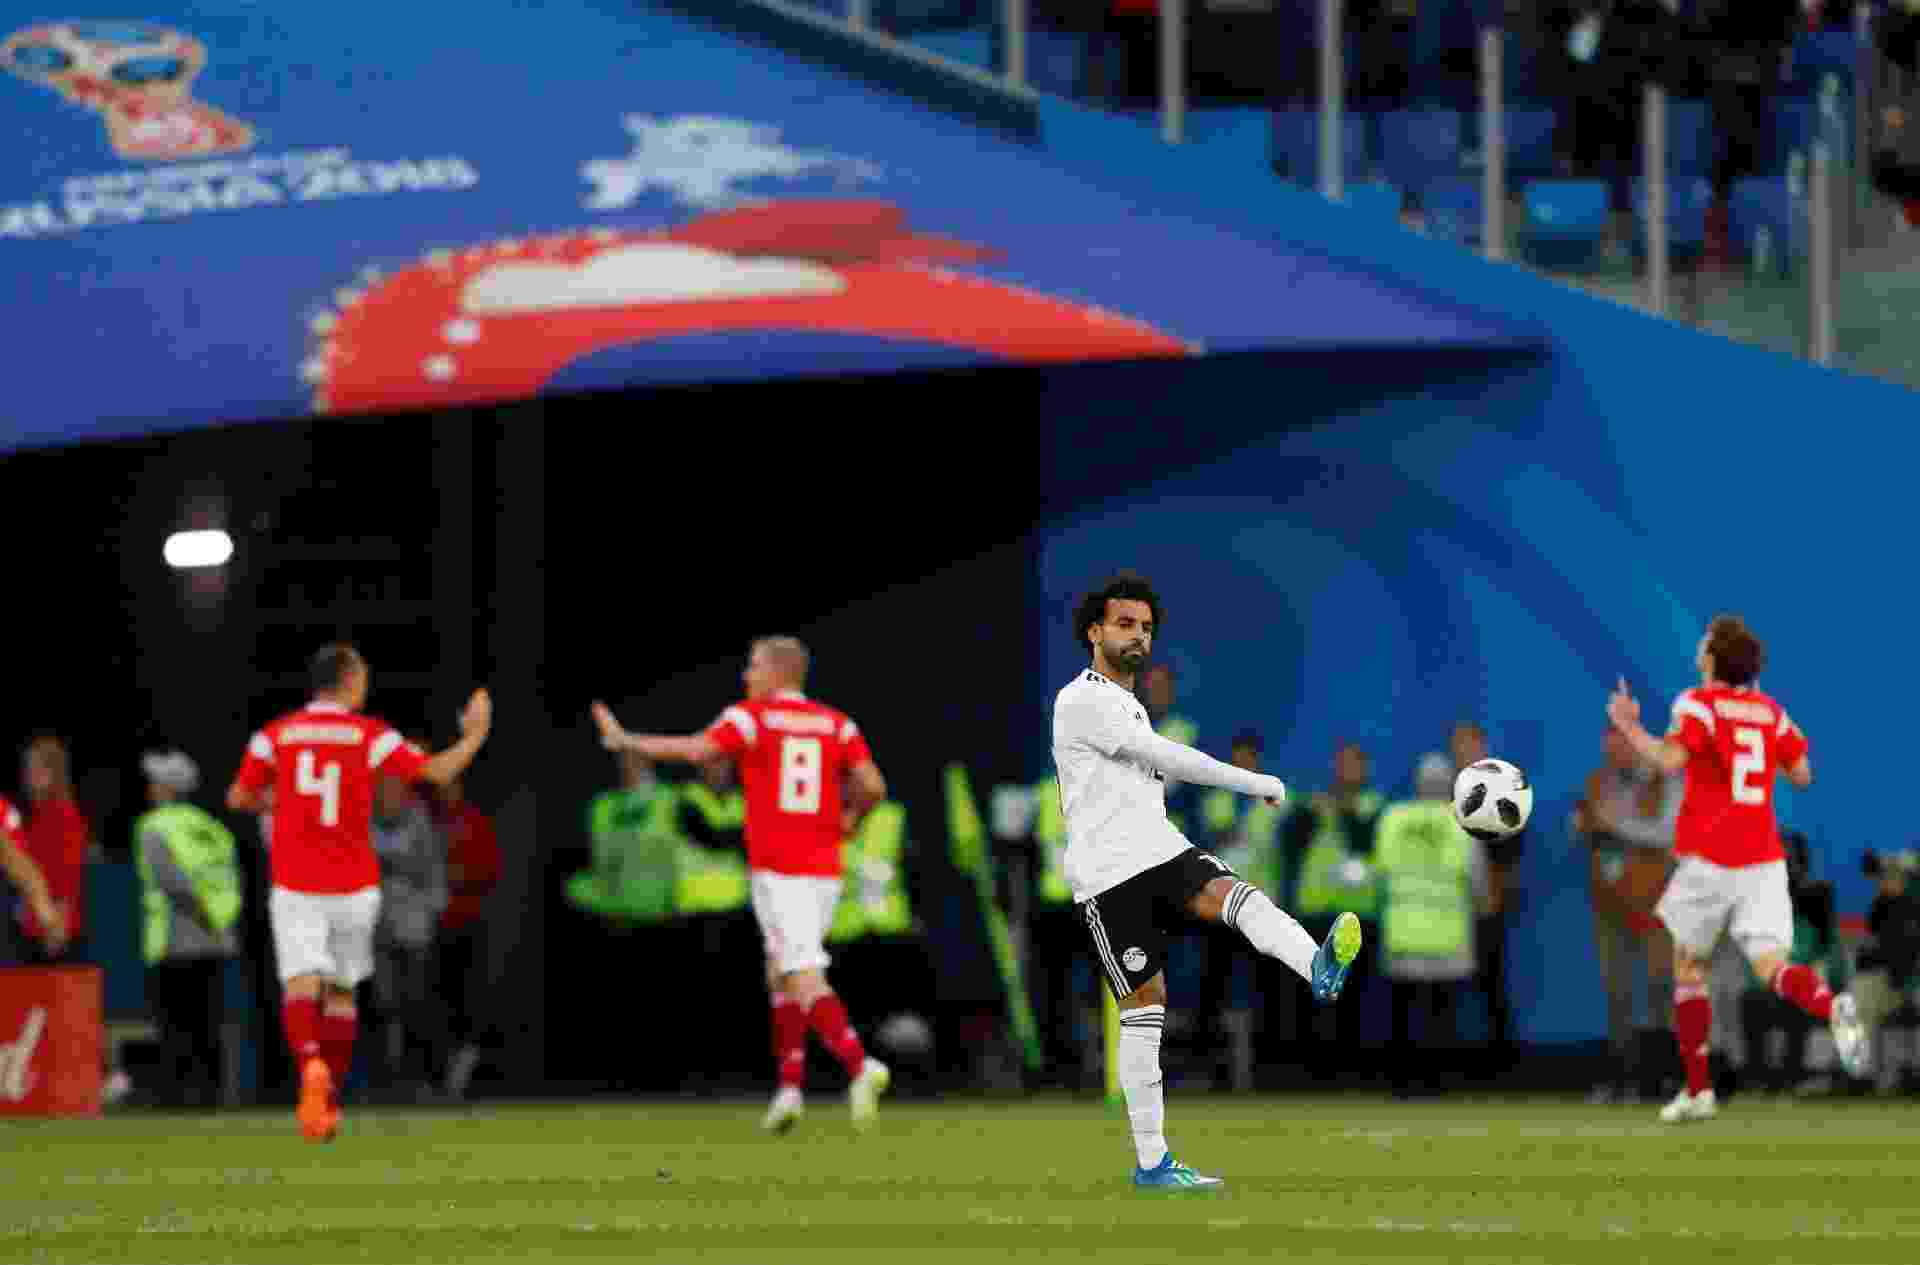 Mohamed Salah lamenta gol feito pela Rússia contra o Egito - Lee Smith/Reuters